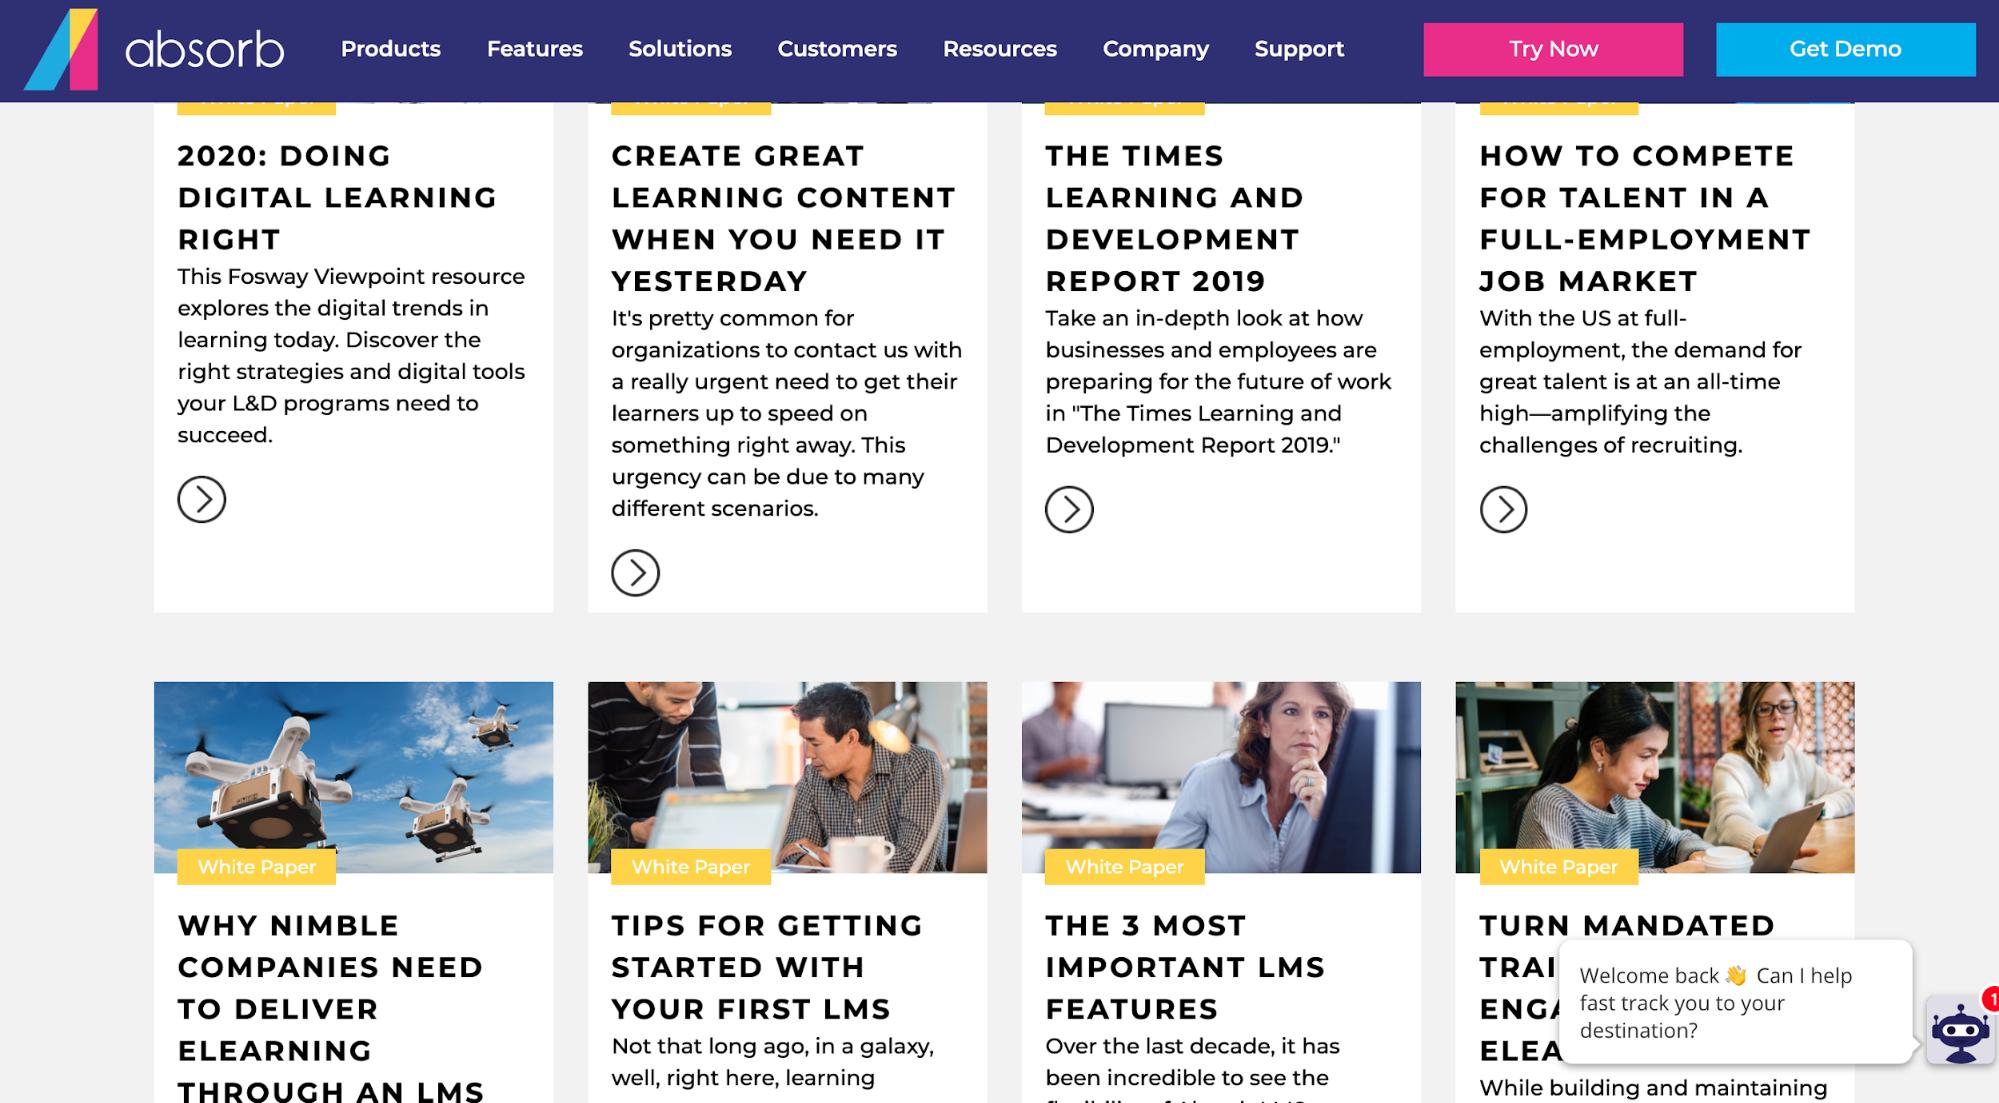 account-based-marketing-example-2